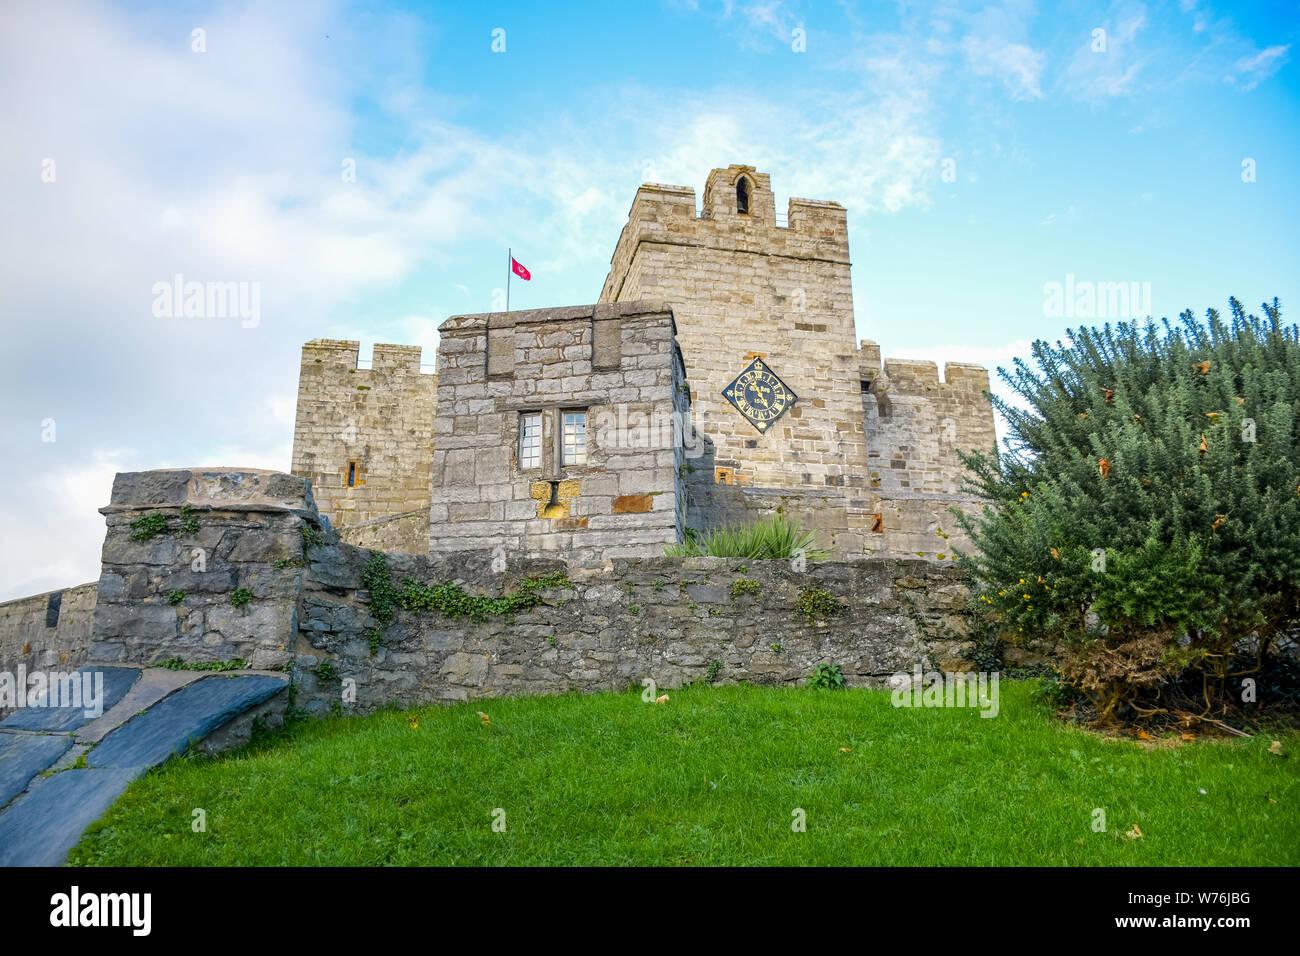 The Castle Rushen in Castletown in a clear blue sky, Isle of Man Stock Photo